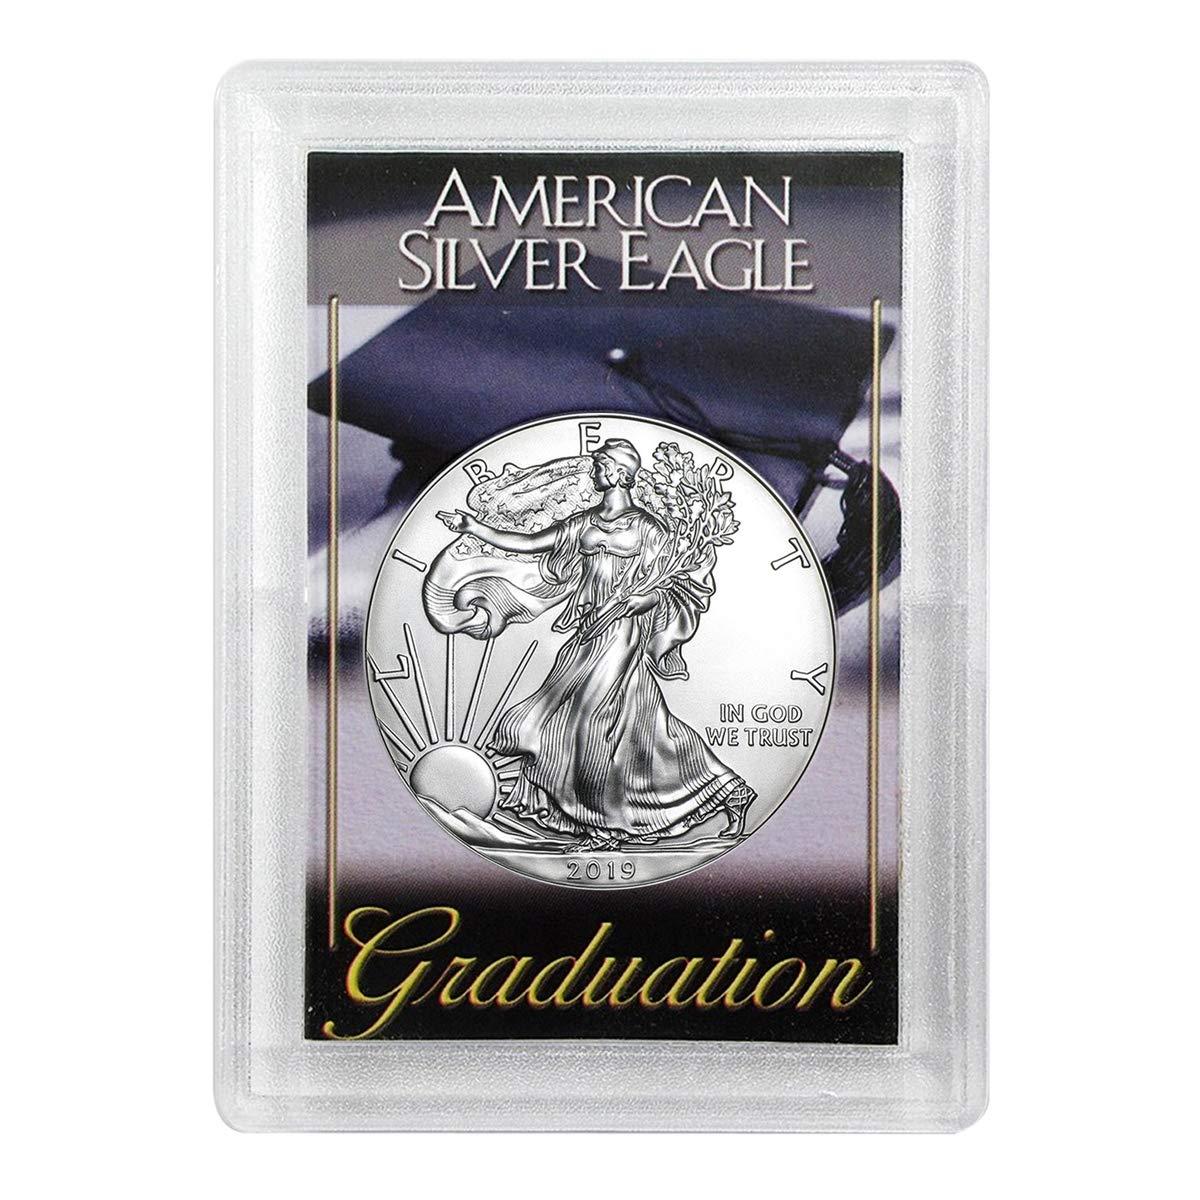 American Silver Eagle inGraduation Holder Dollar Uncirculated Us Mint 2019